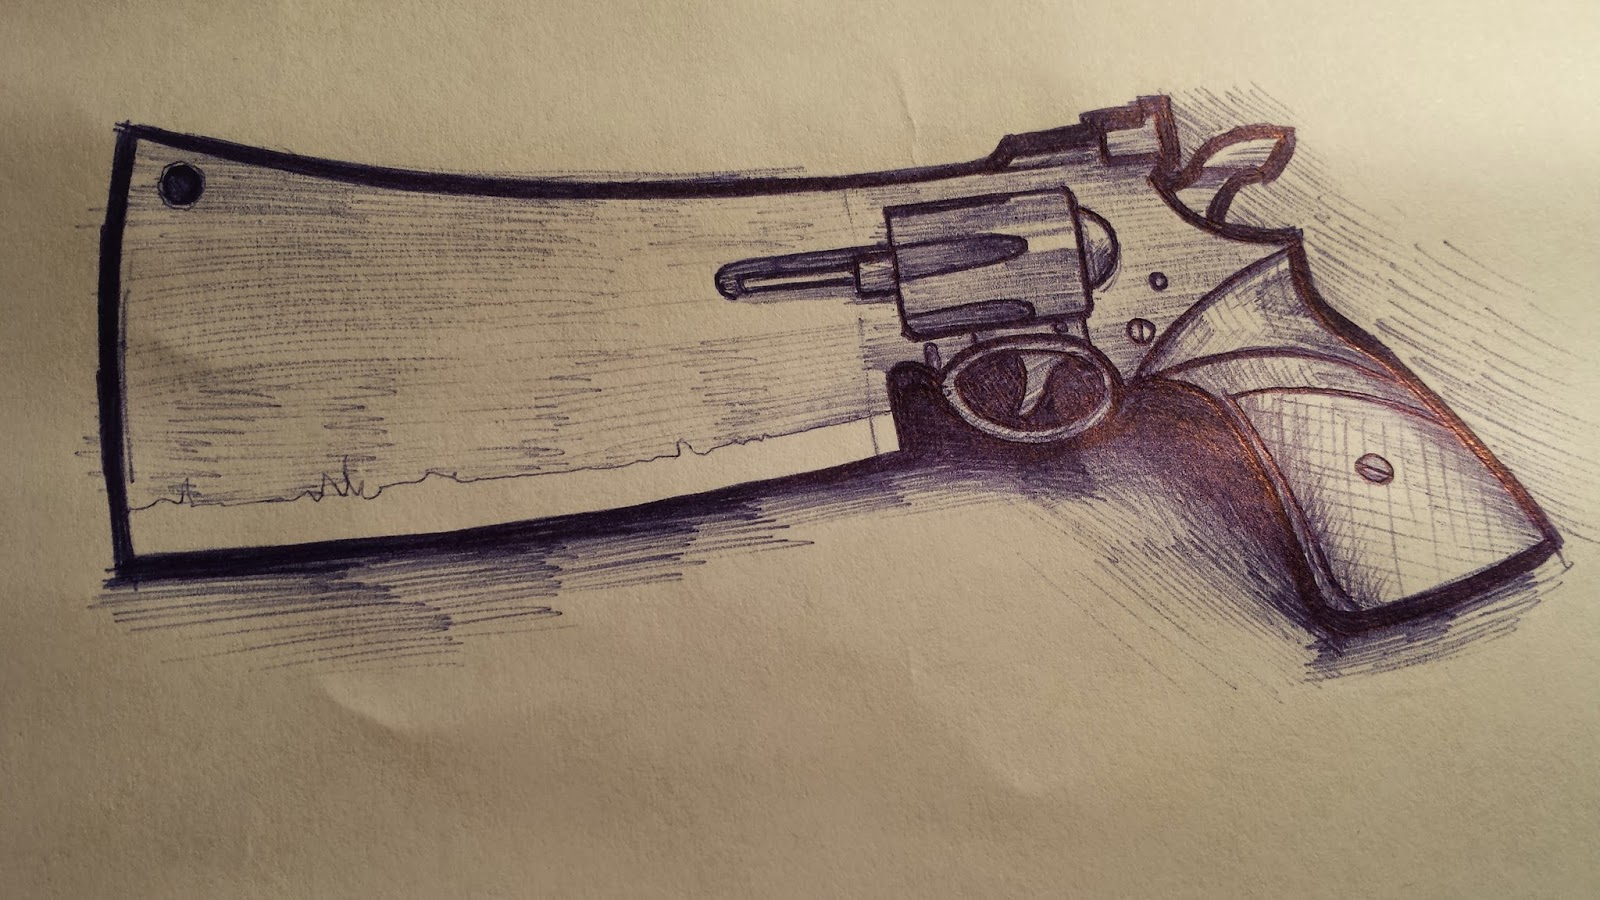 Gunblade Drawings and Designs 1